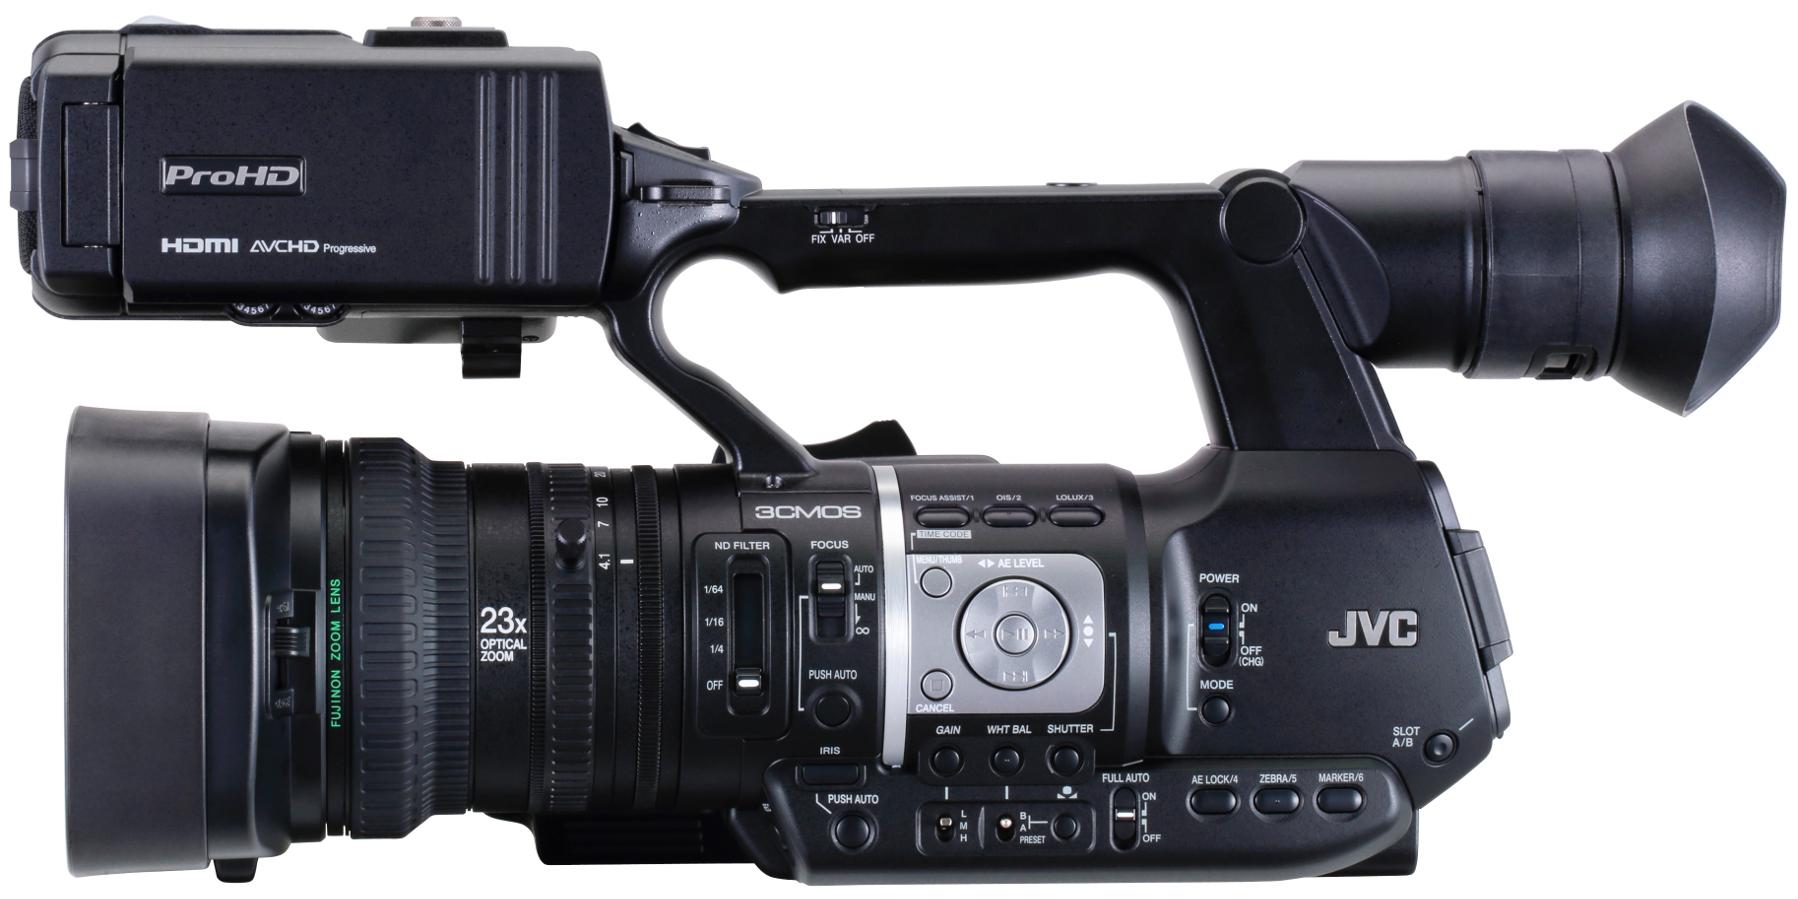 JVC GY-HM620U Mobile News Camera with 23x Lens GYHM620U